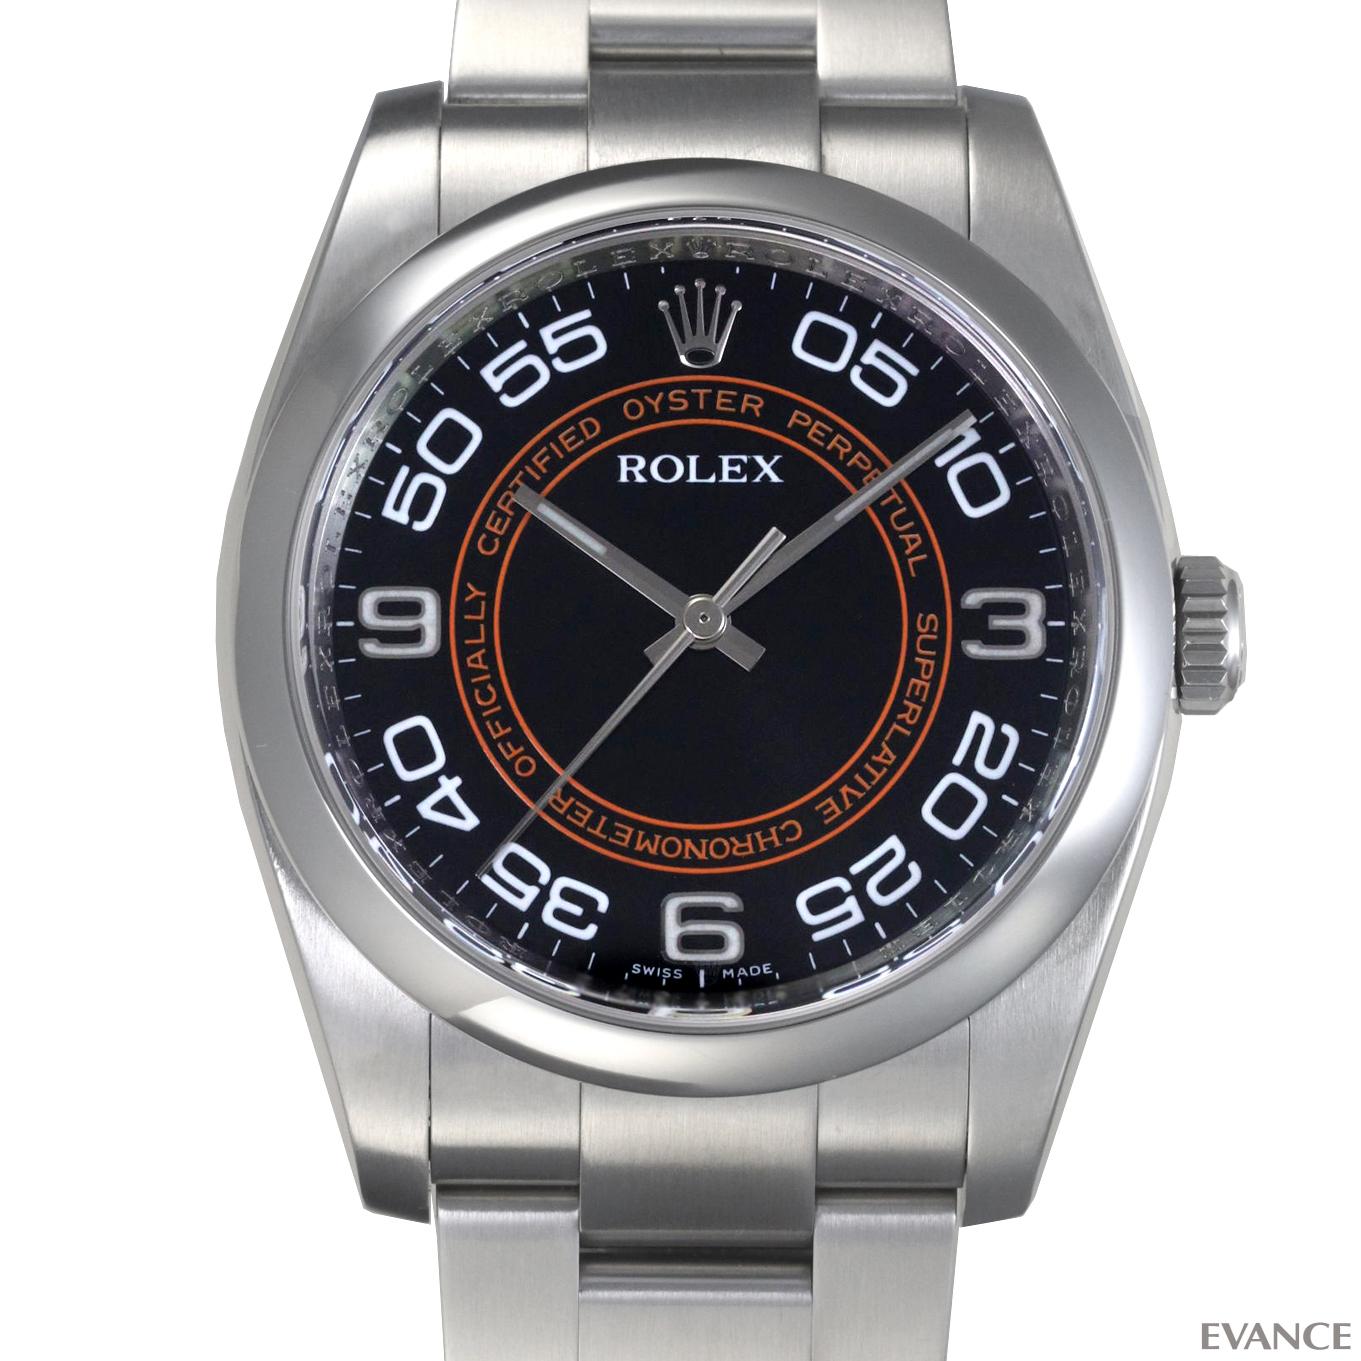 ROLEX ロレックス オイスター パーペチュアル 116000